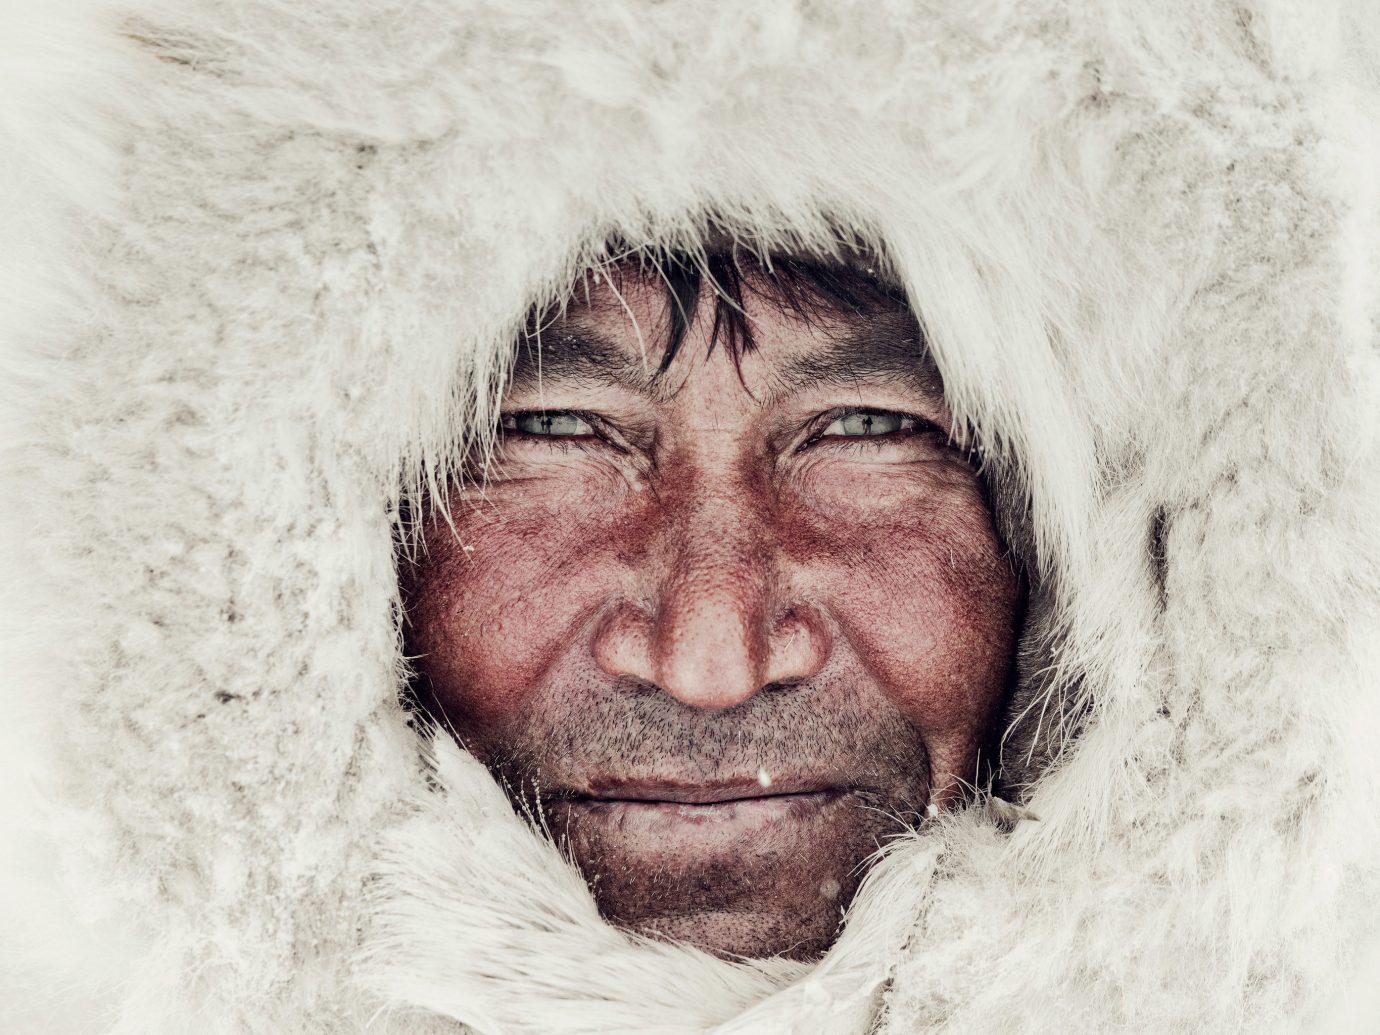 Arts + Culture man face white clothing portrait Winter male close up head facial hair snow drawing sketch hair fur close